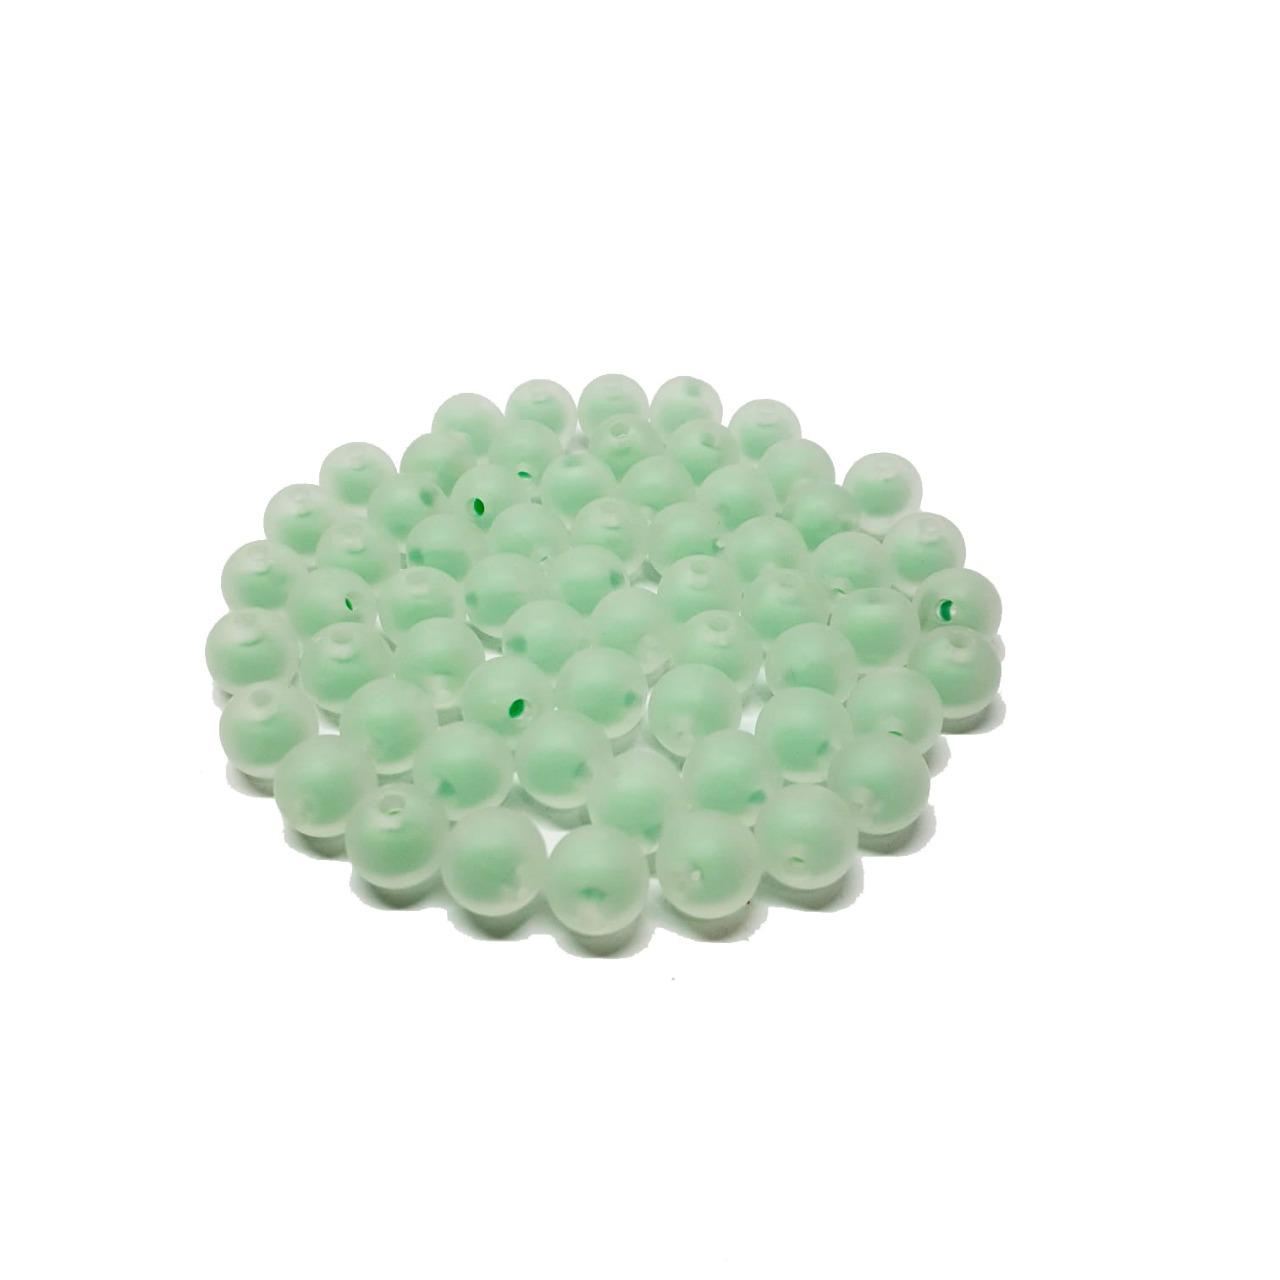 Bola de Plástico Fosca com Miolo Verde